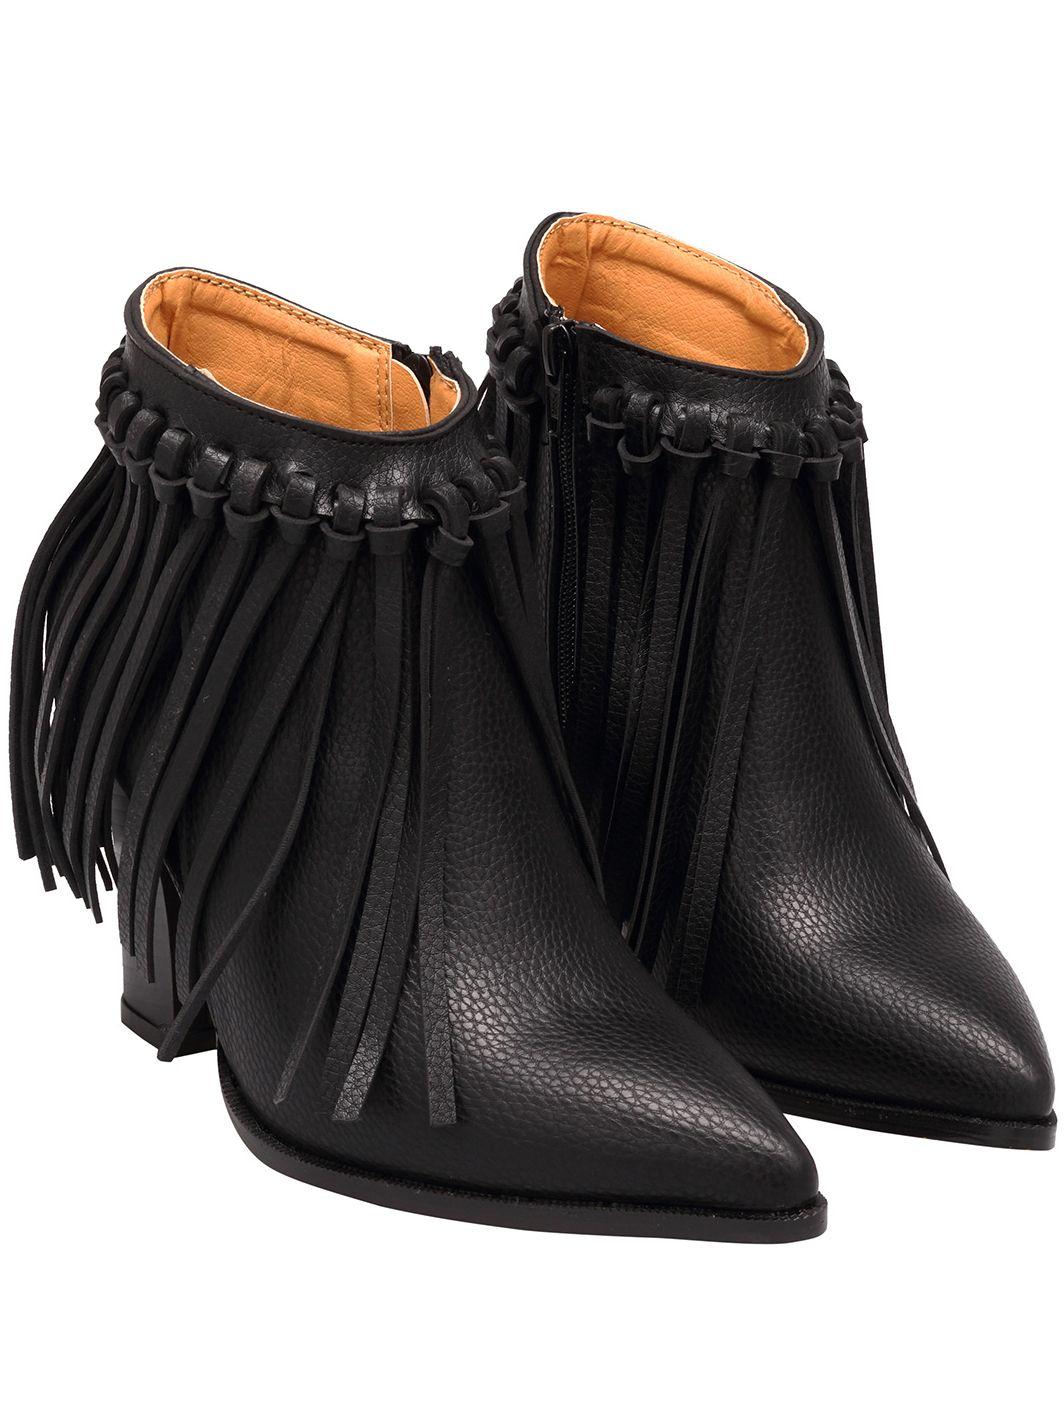 Cheap Womens Boots: Ankle, Knee High, Thigh High